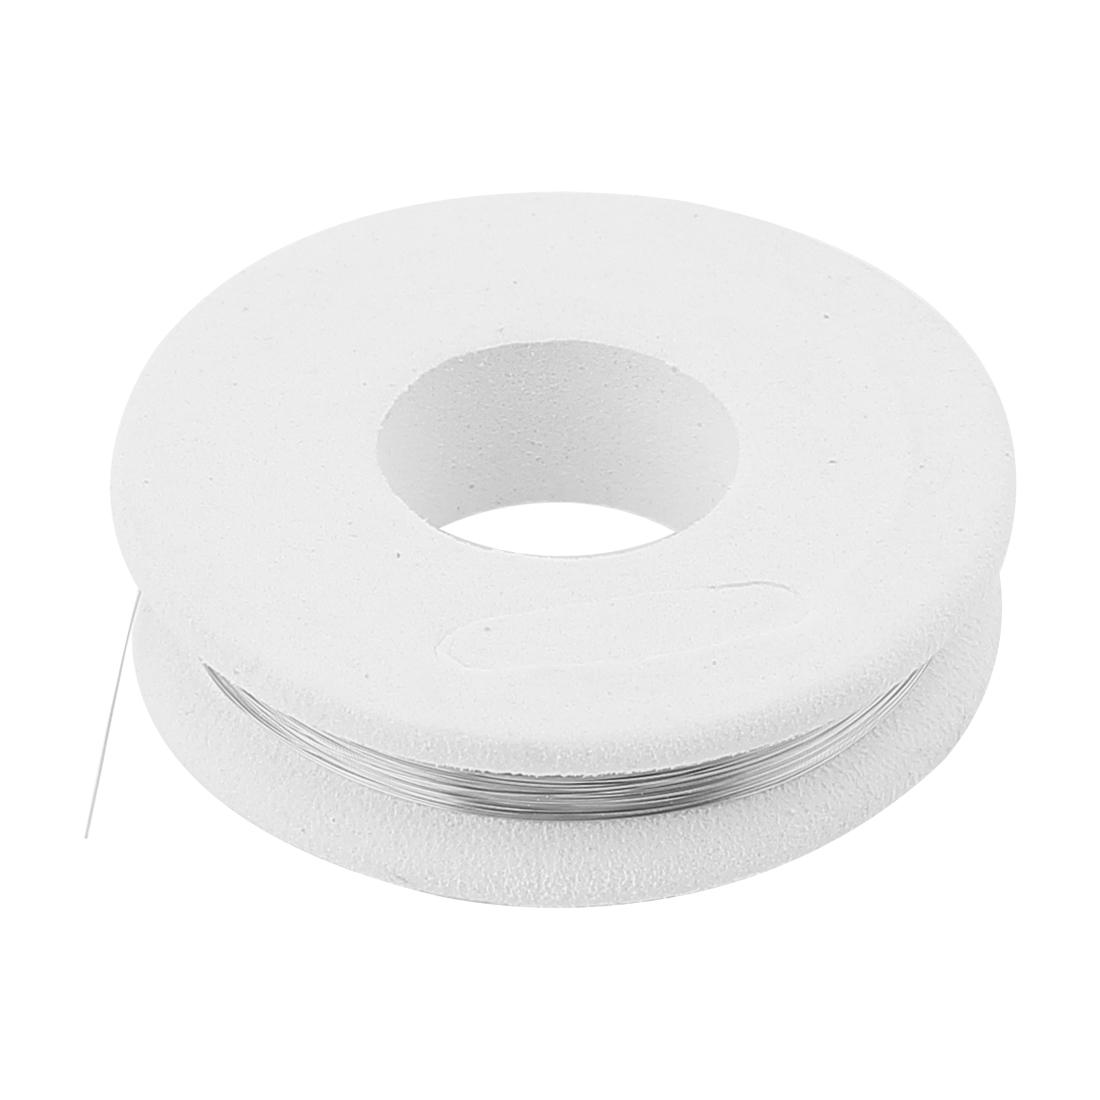 Nichrome 80 Round Wire 0.1mm 38Gauge AWG 32.8ft Roll 138.8Ohm/m Heater Wire